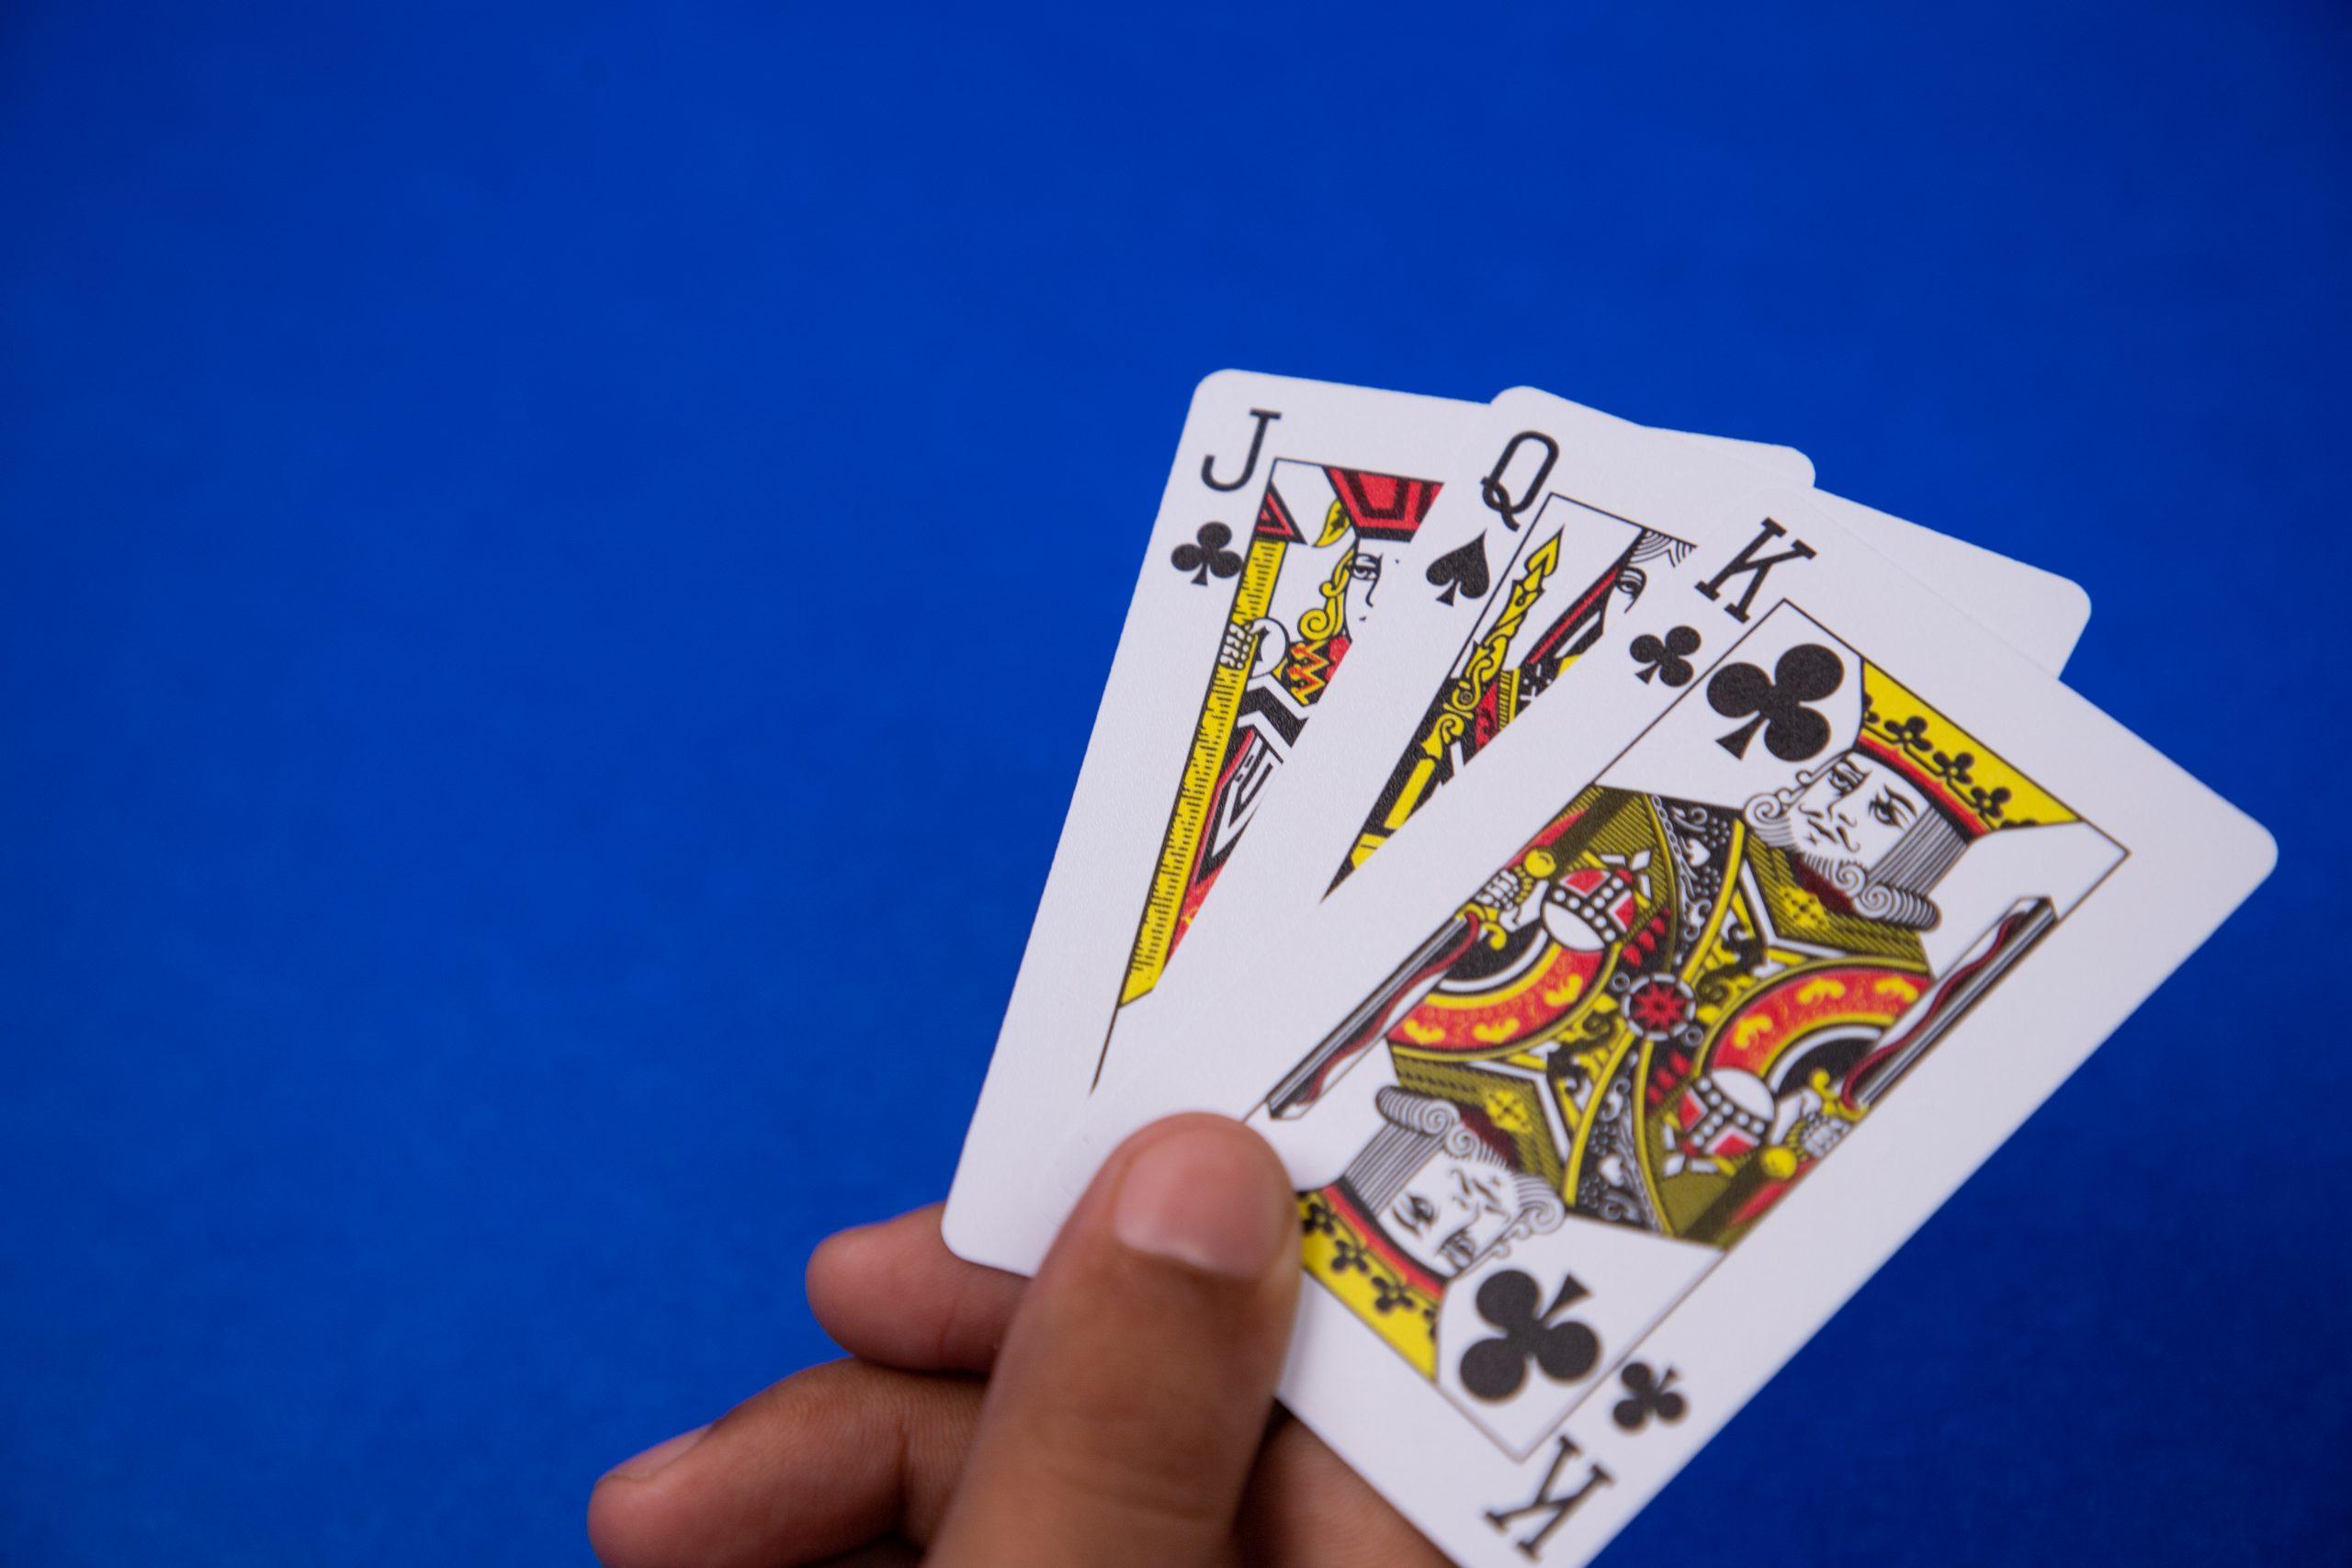 A Teenpatti card in Hand